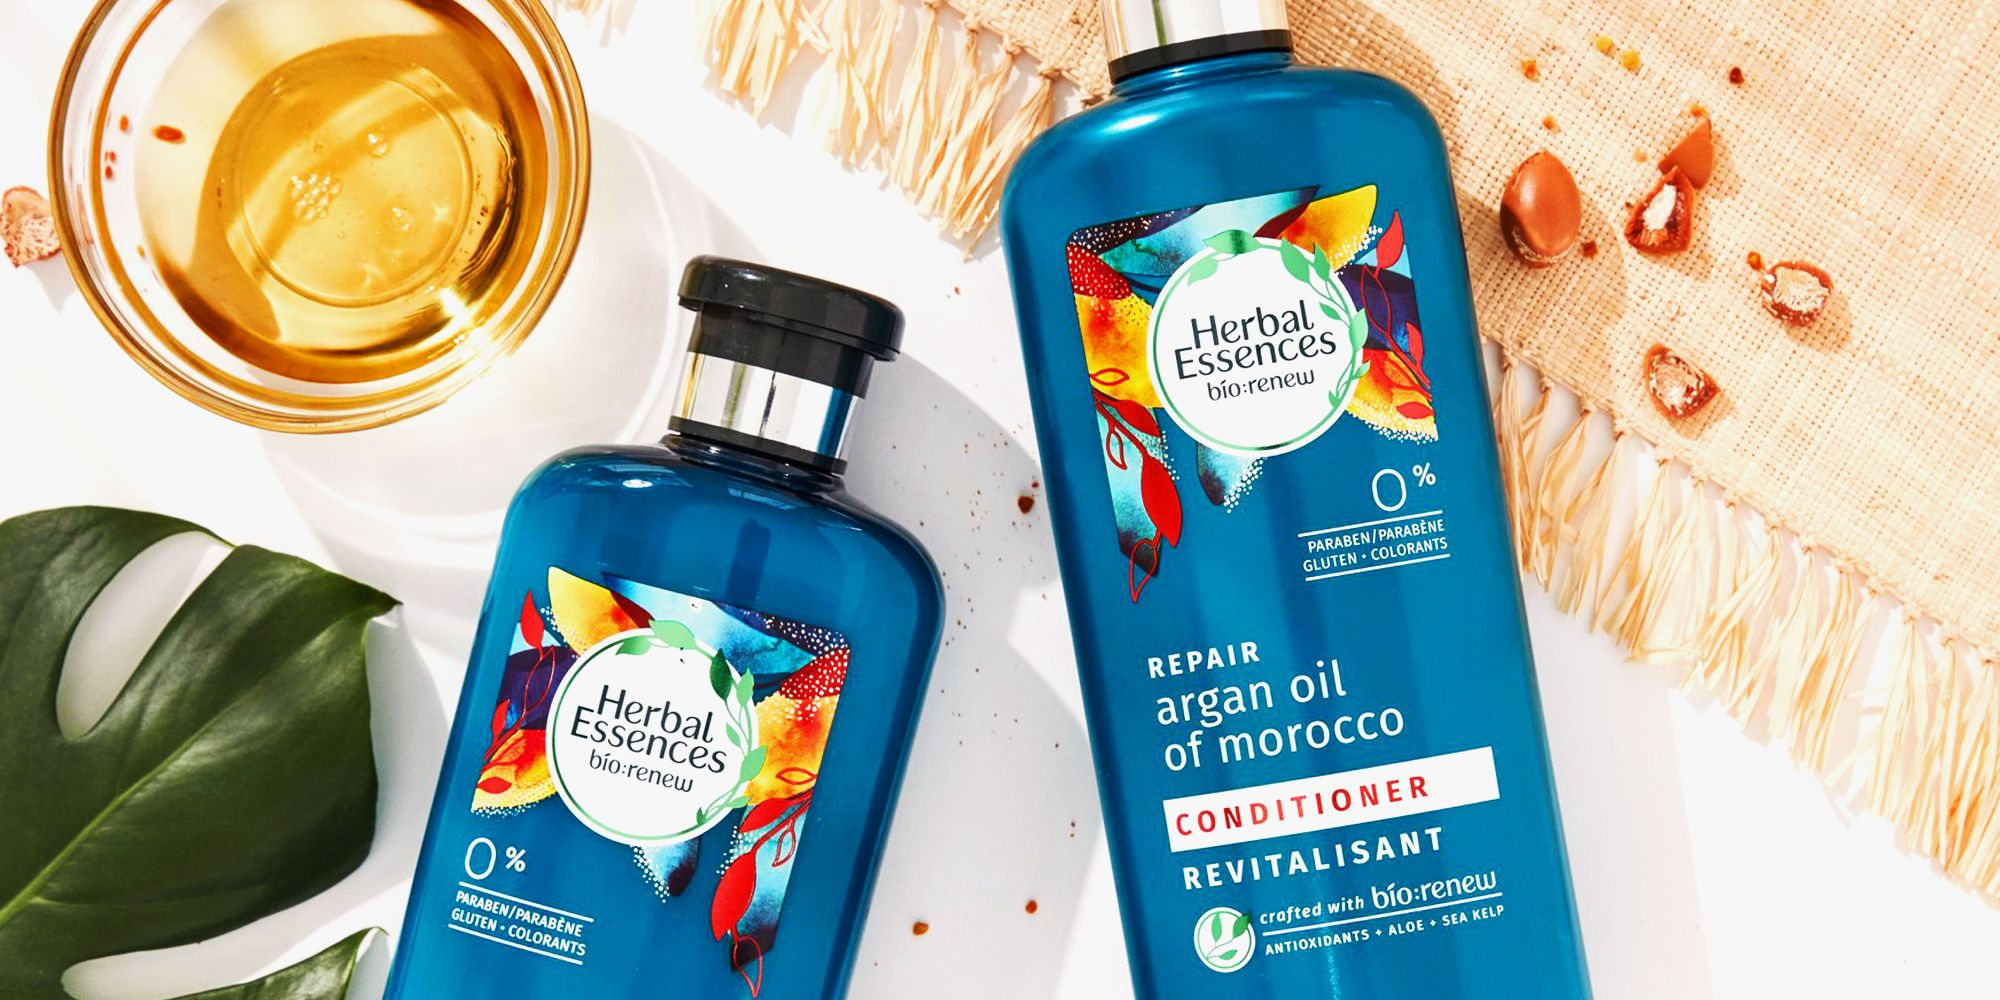 10 Best Argan Oil Shampoos In 2018 Hydrating Shampoo With Moroccan Argan Oil